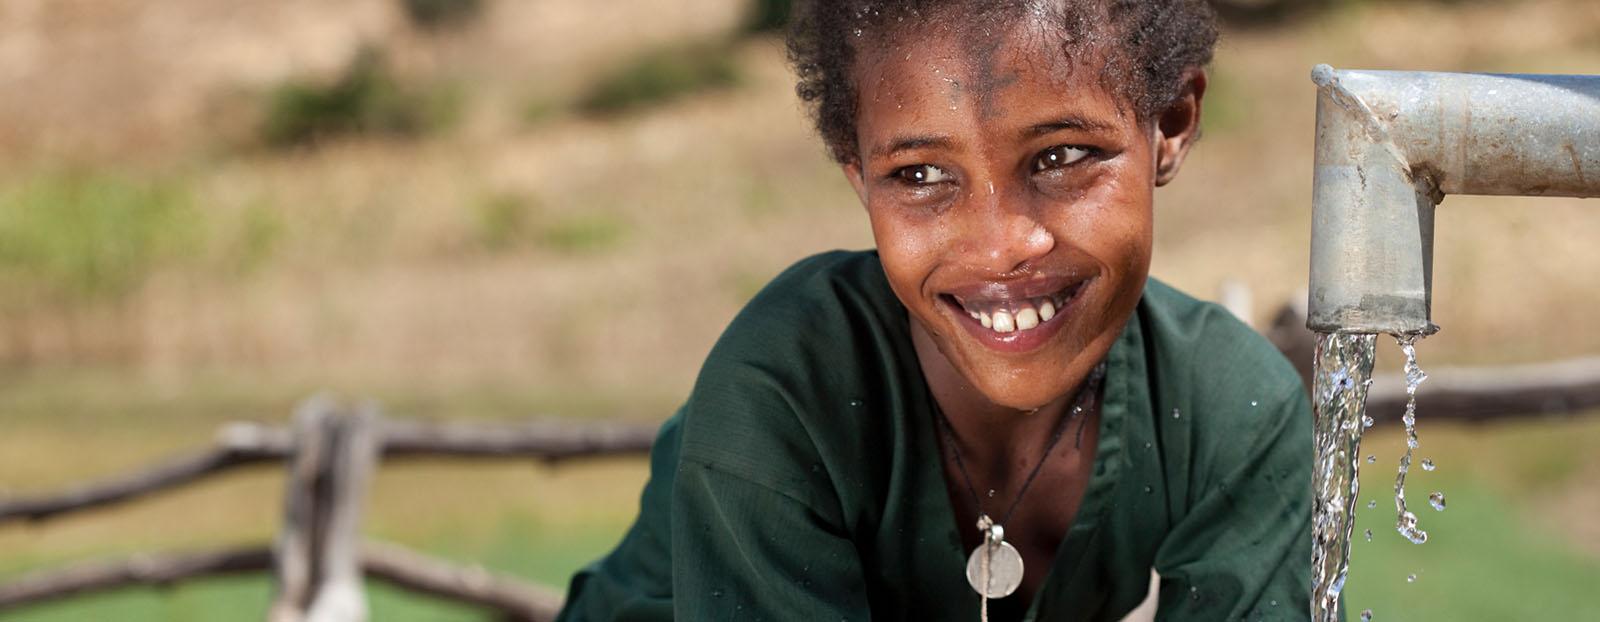 gives/ethiopian_spring_1.jpg